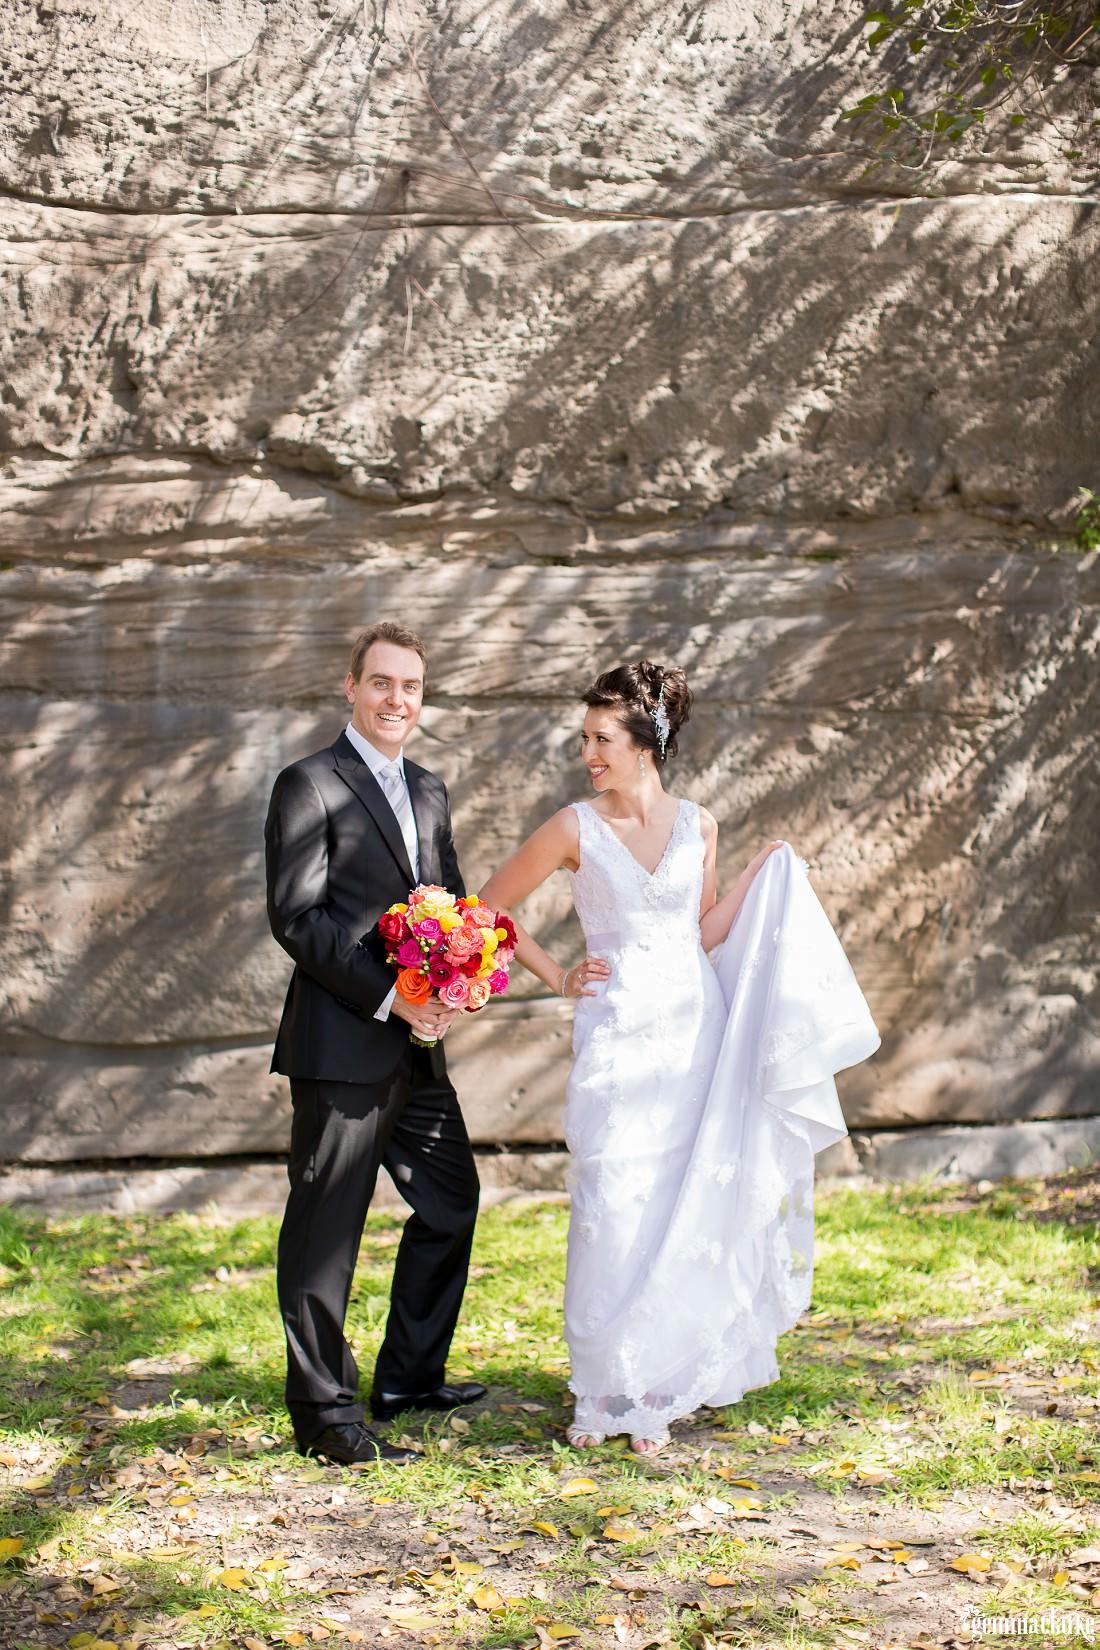 gemmaclarkephotography_fun-sydney-wedding_italian-village-reception_tina-and-thomas_0017